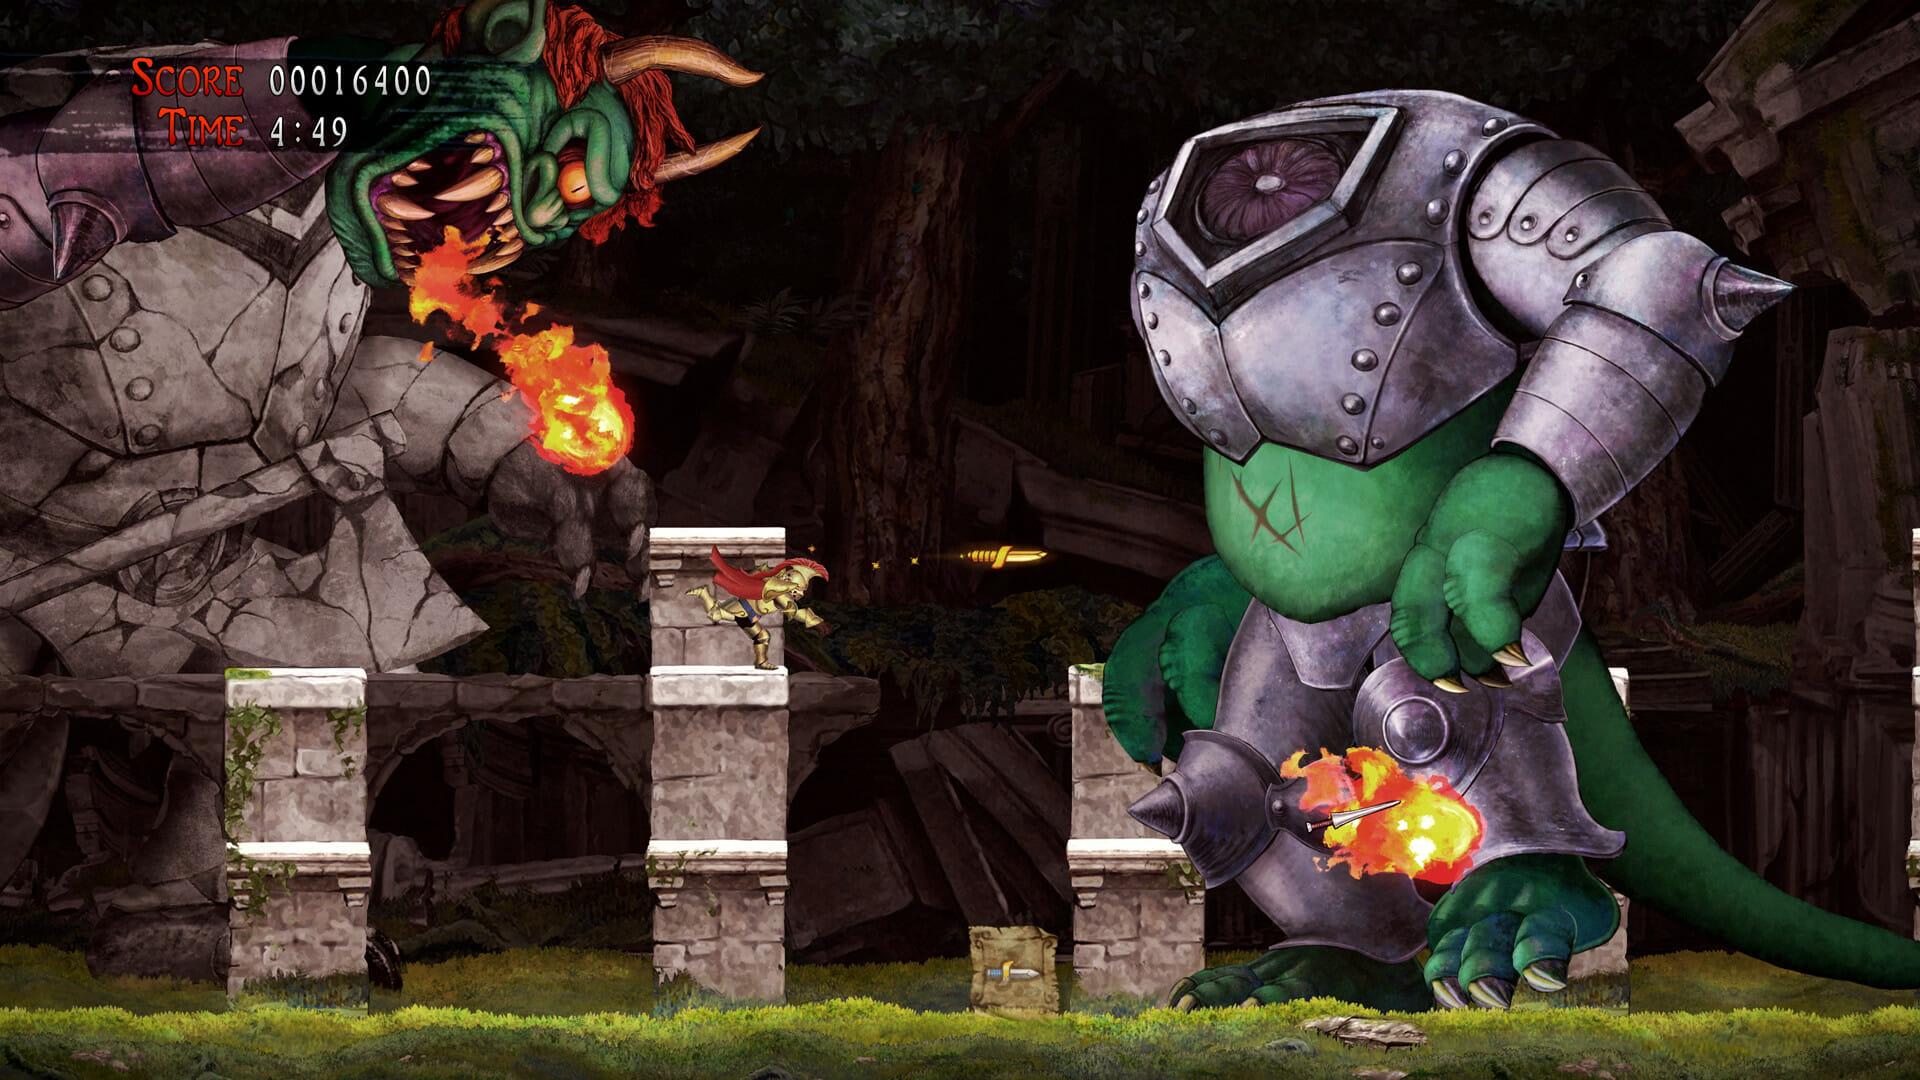 Ghosts 'n Goblins Resurrection Save-Game